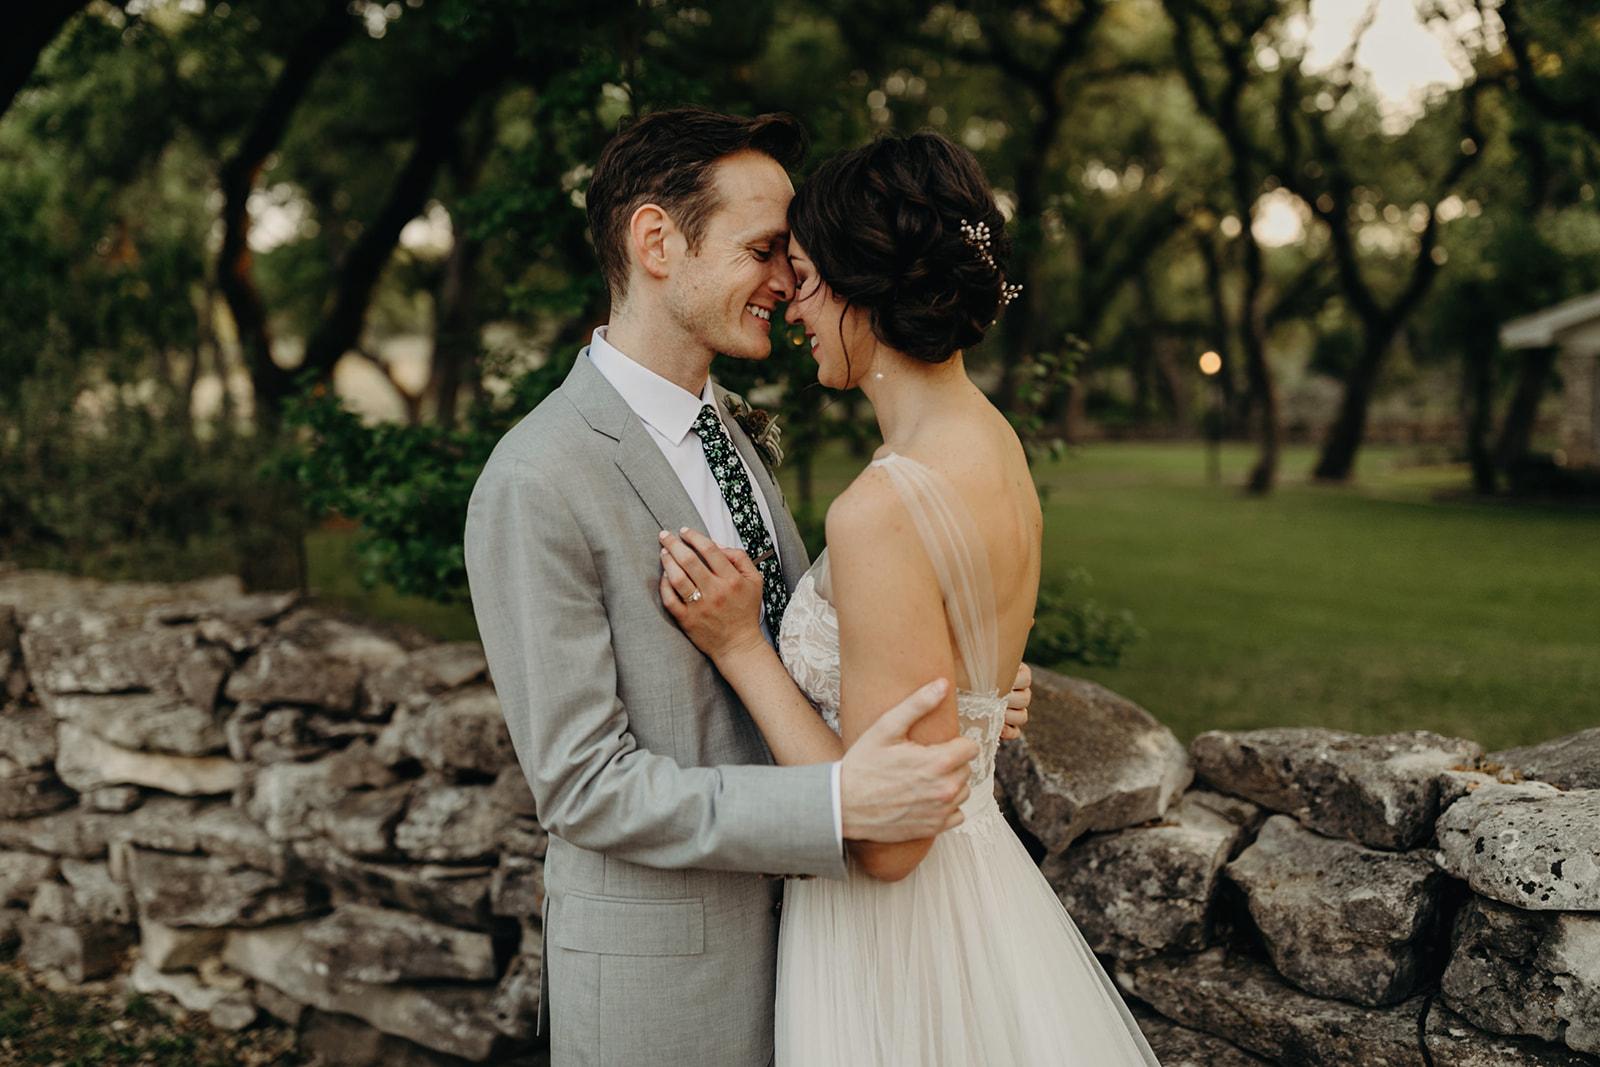 austin-wedding-lindsey-bryce-549.jpg